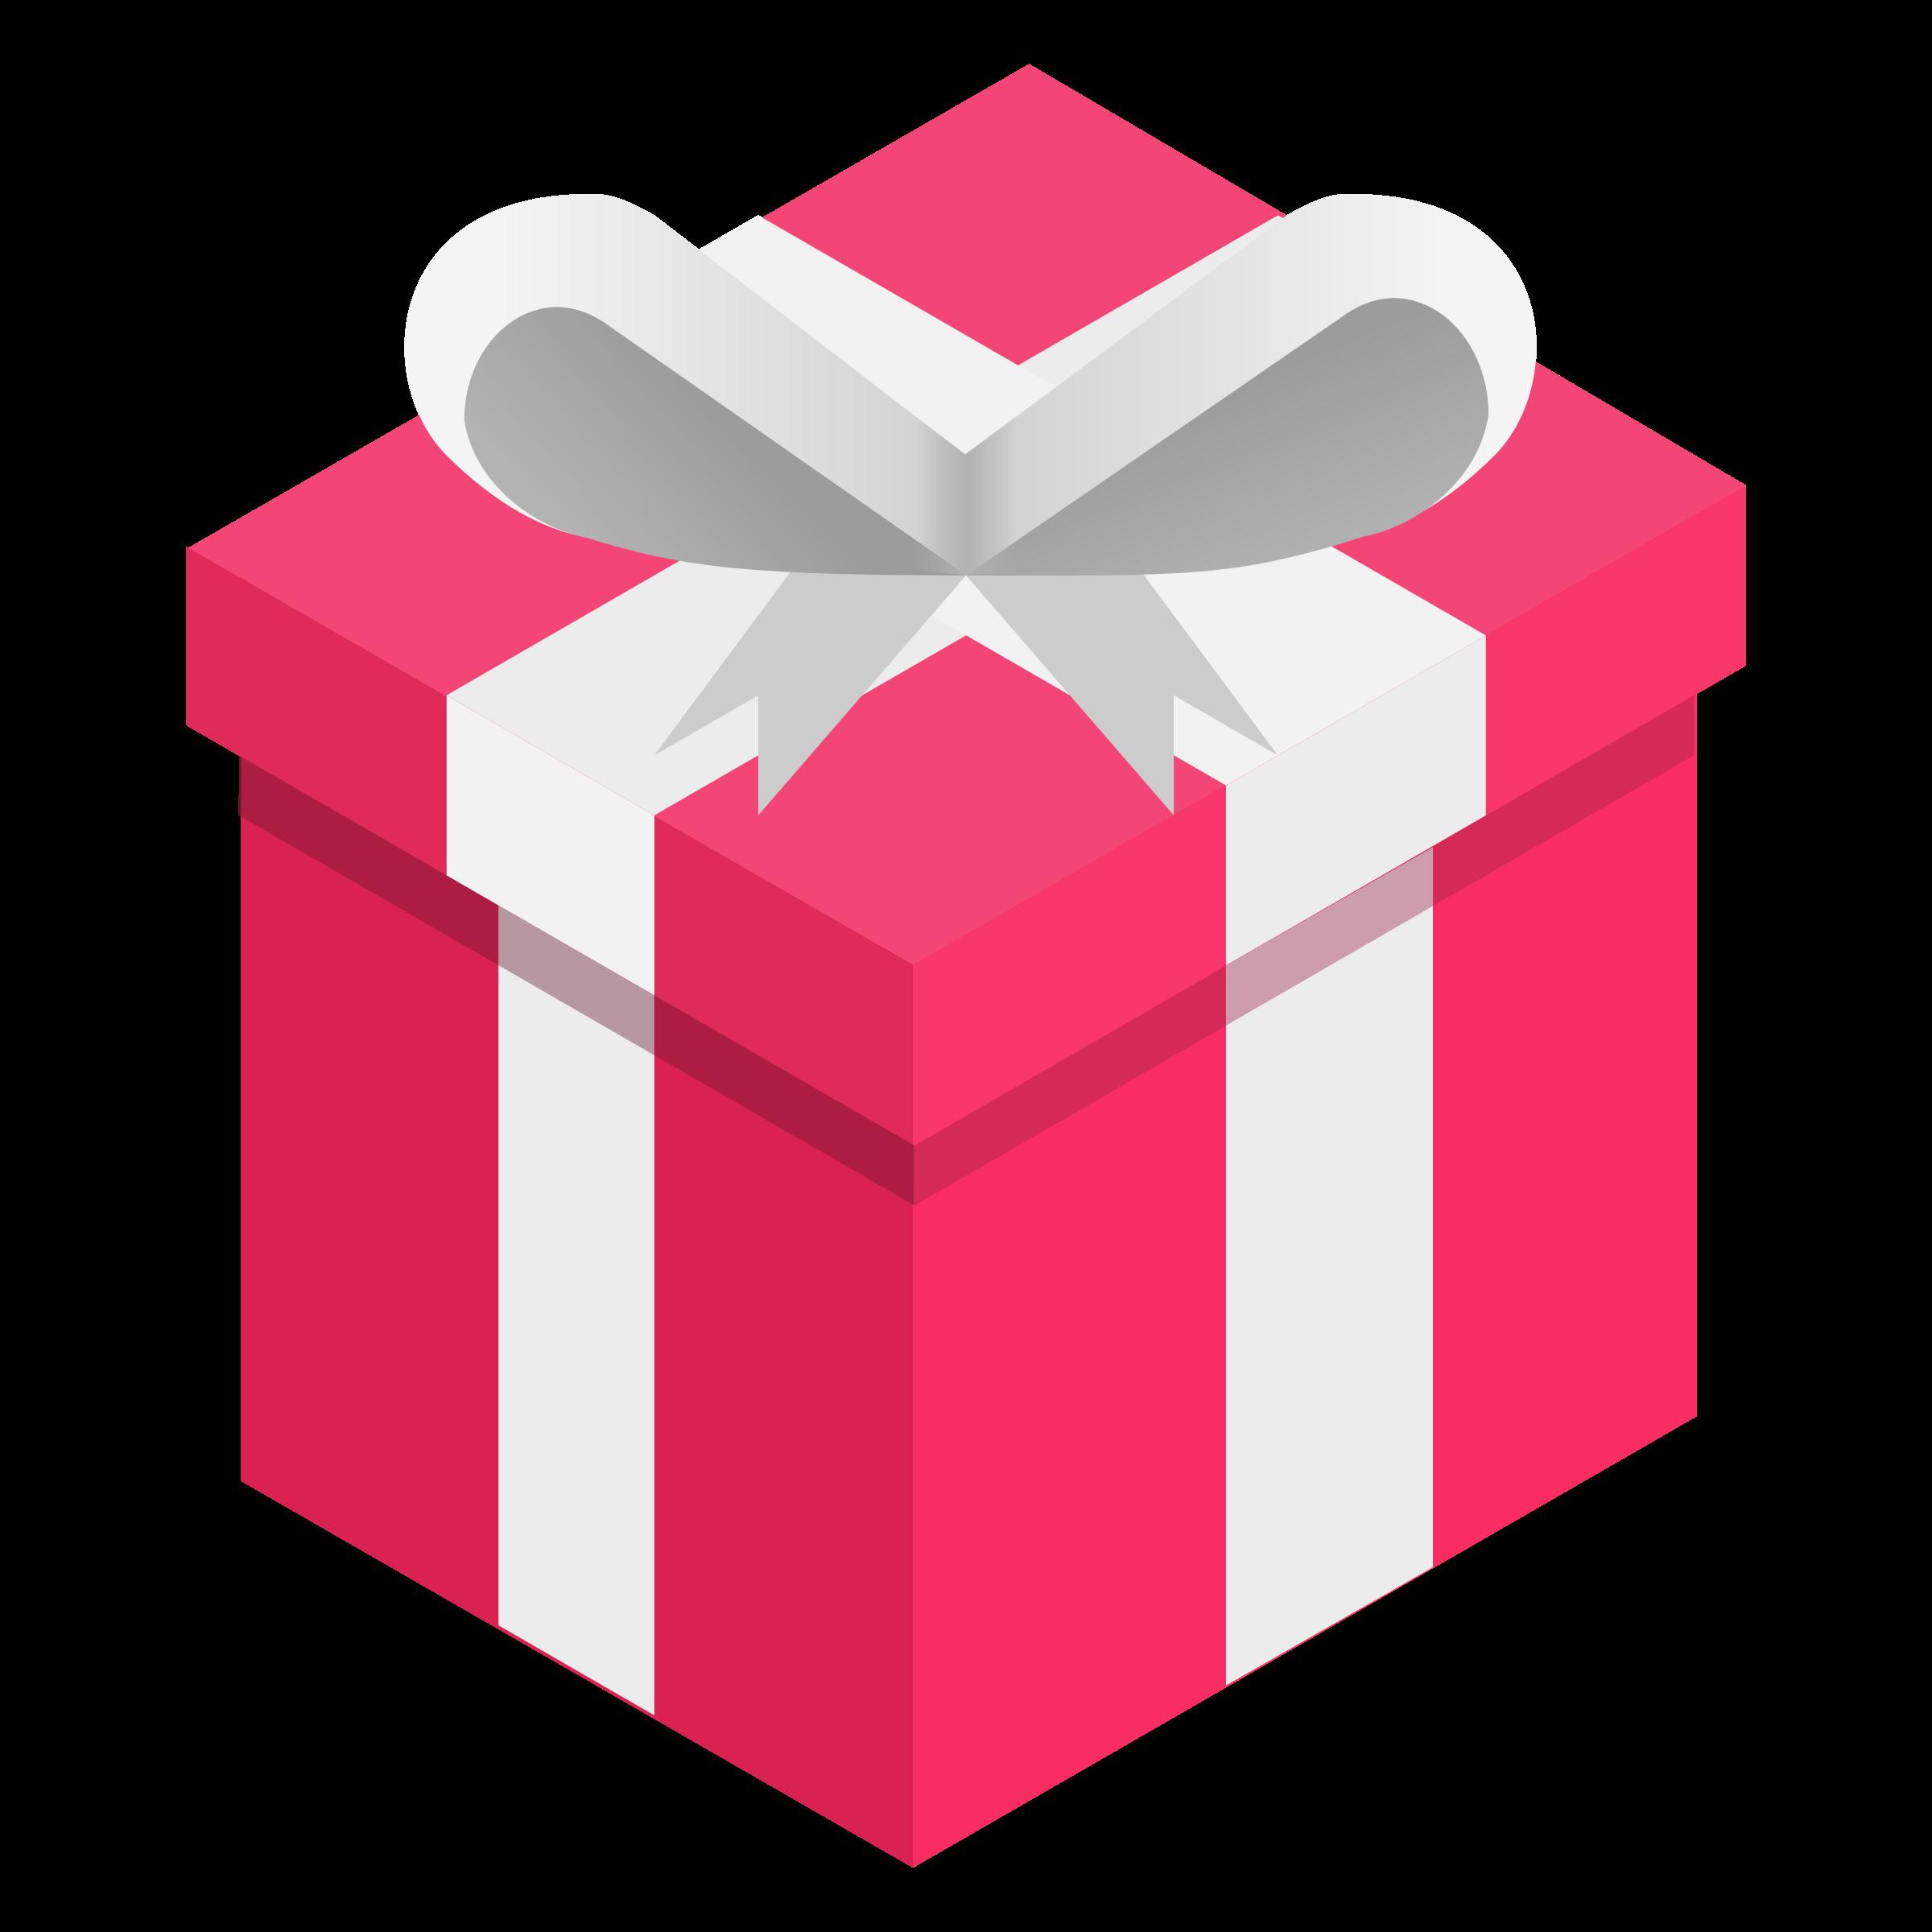 Gift Box By Tatica-Gift Box By Tatica-4